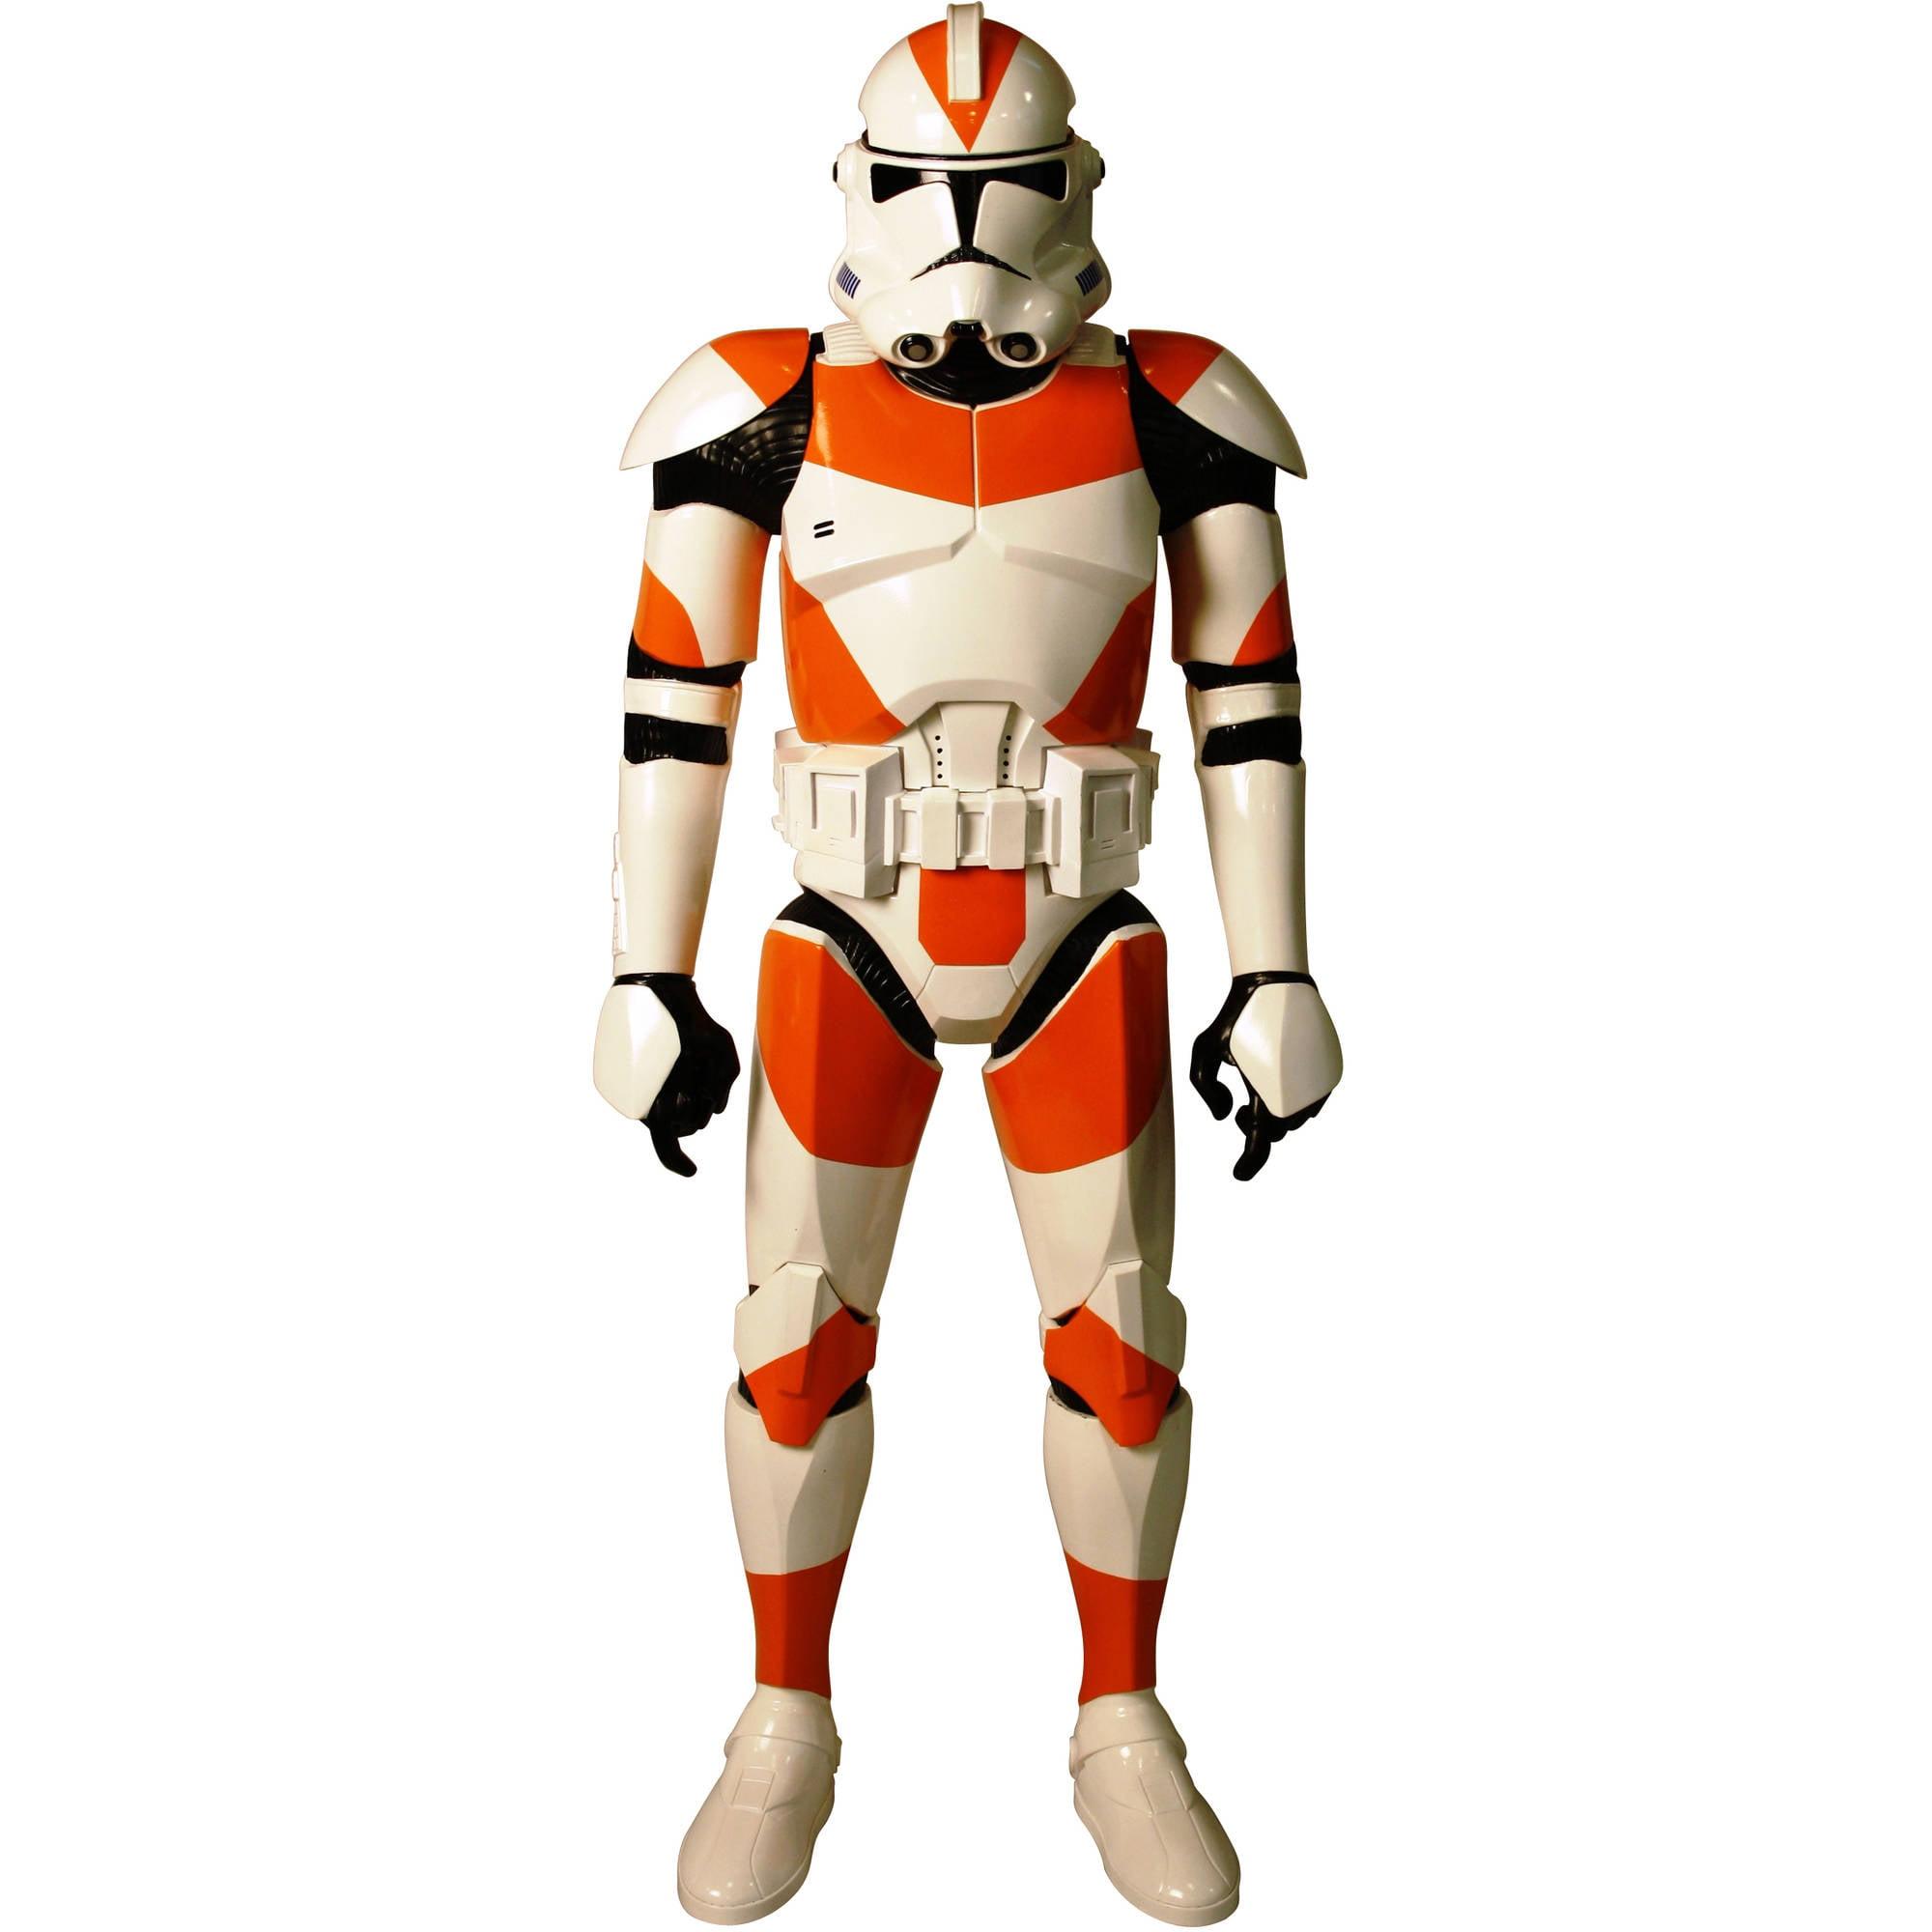 "Star Wars Orange Utapau Clone Trooper Giant 31"" Action Figure"